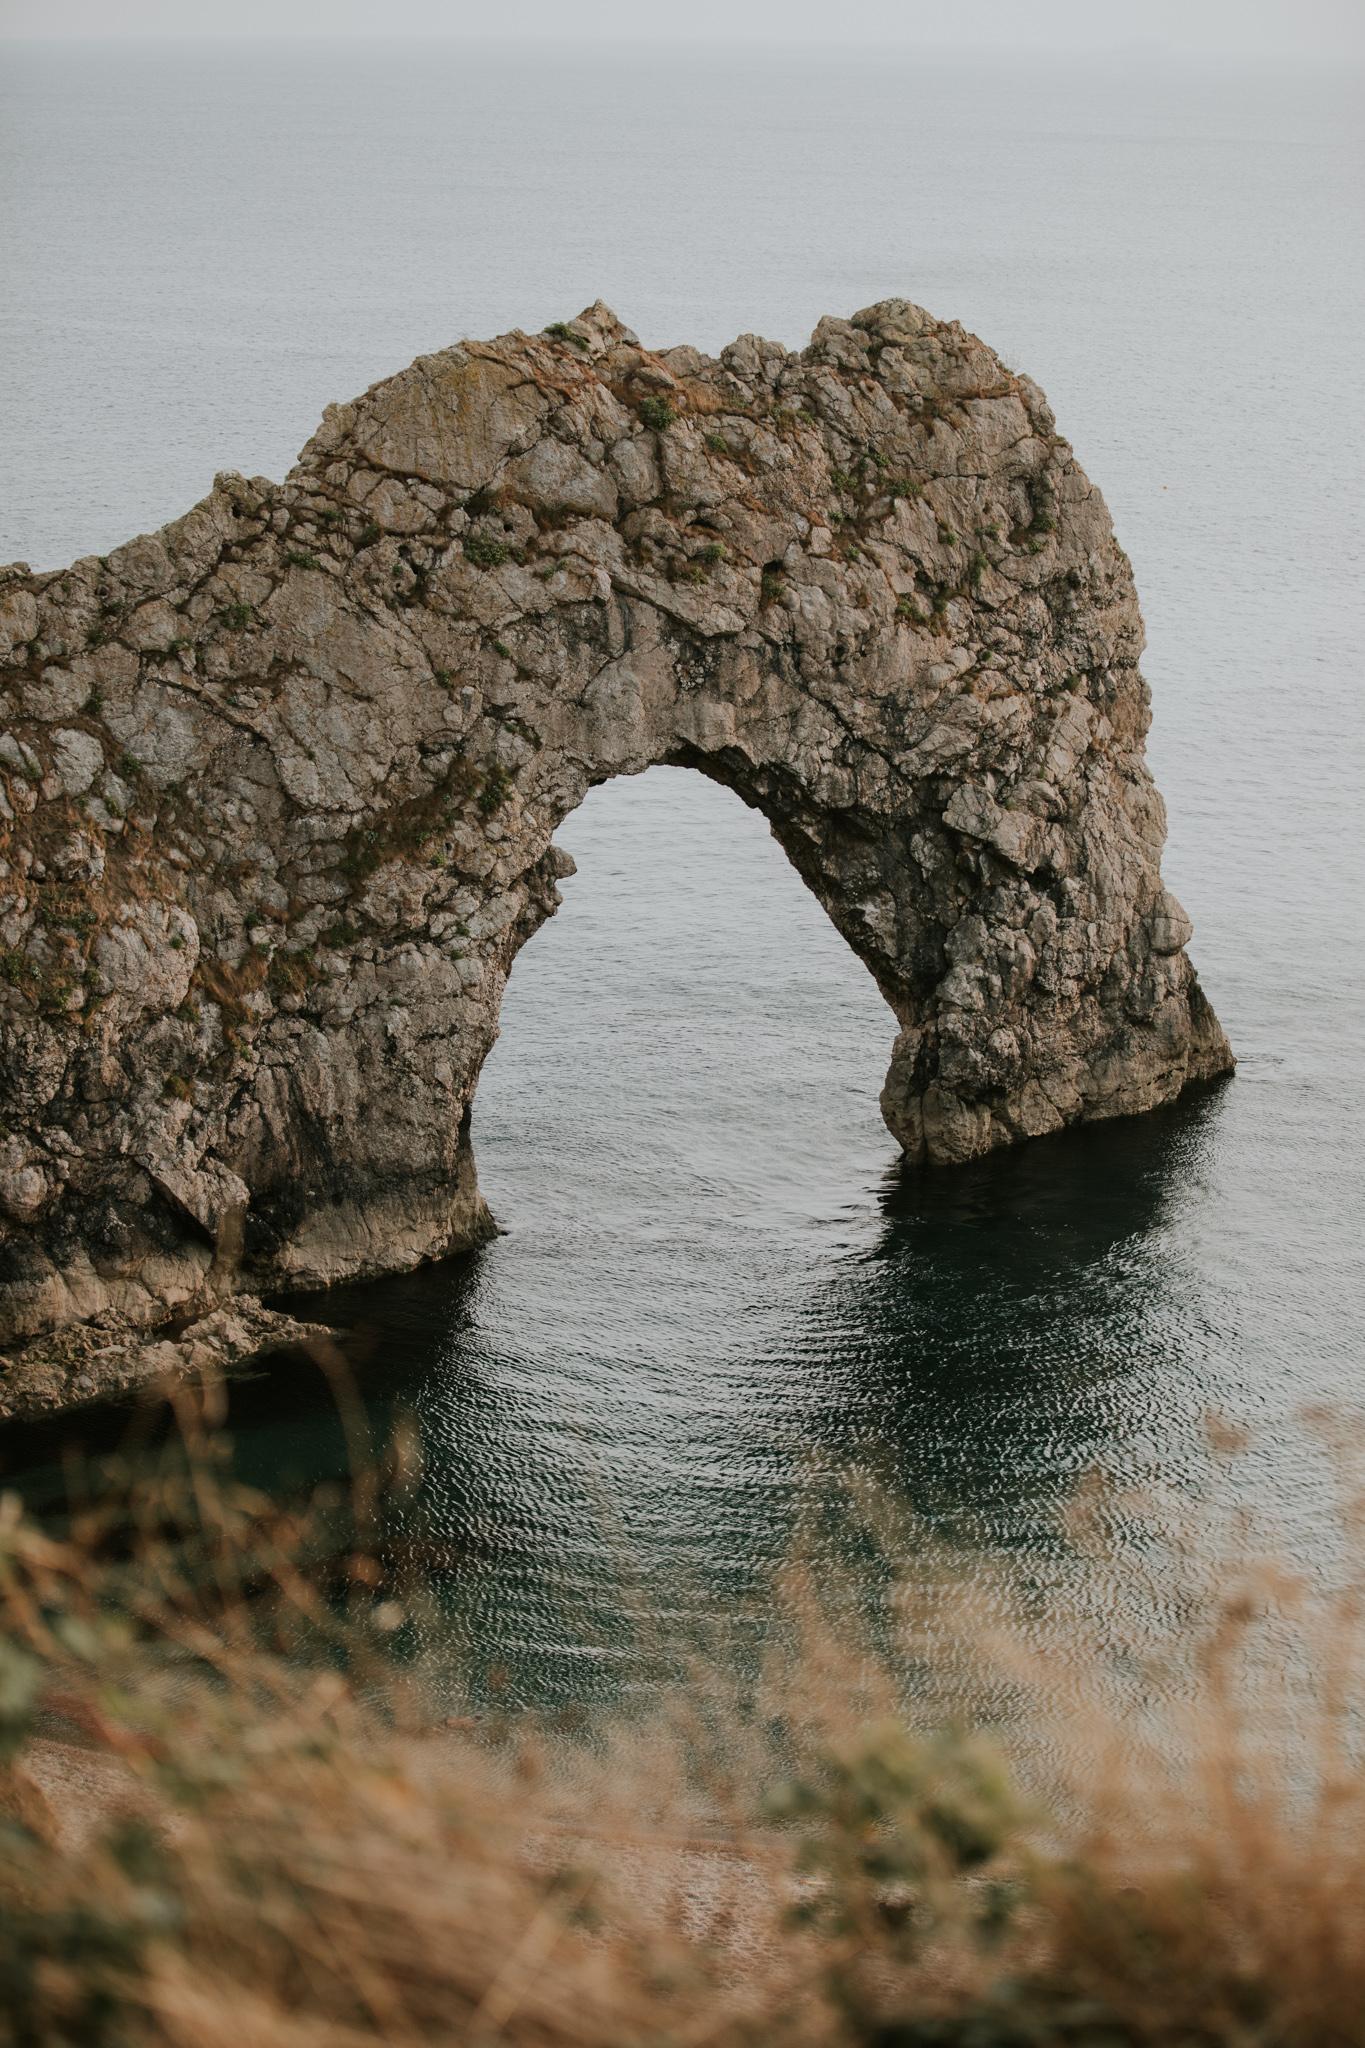 Natalie Skoric - England Travel Photography (144).jpg